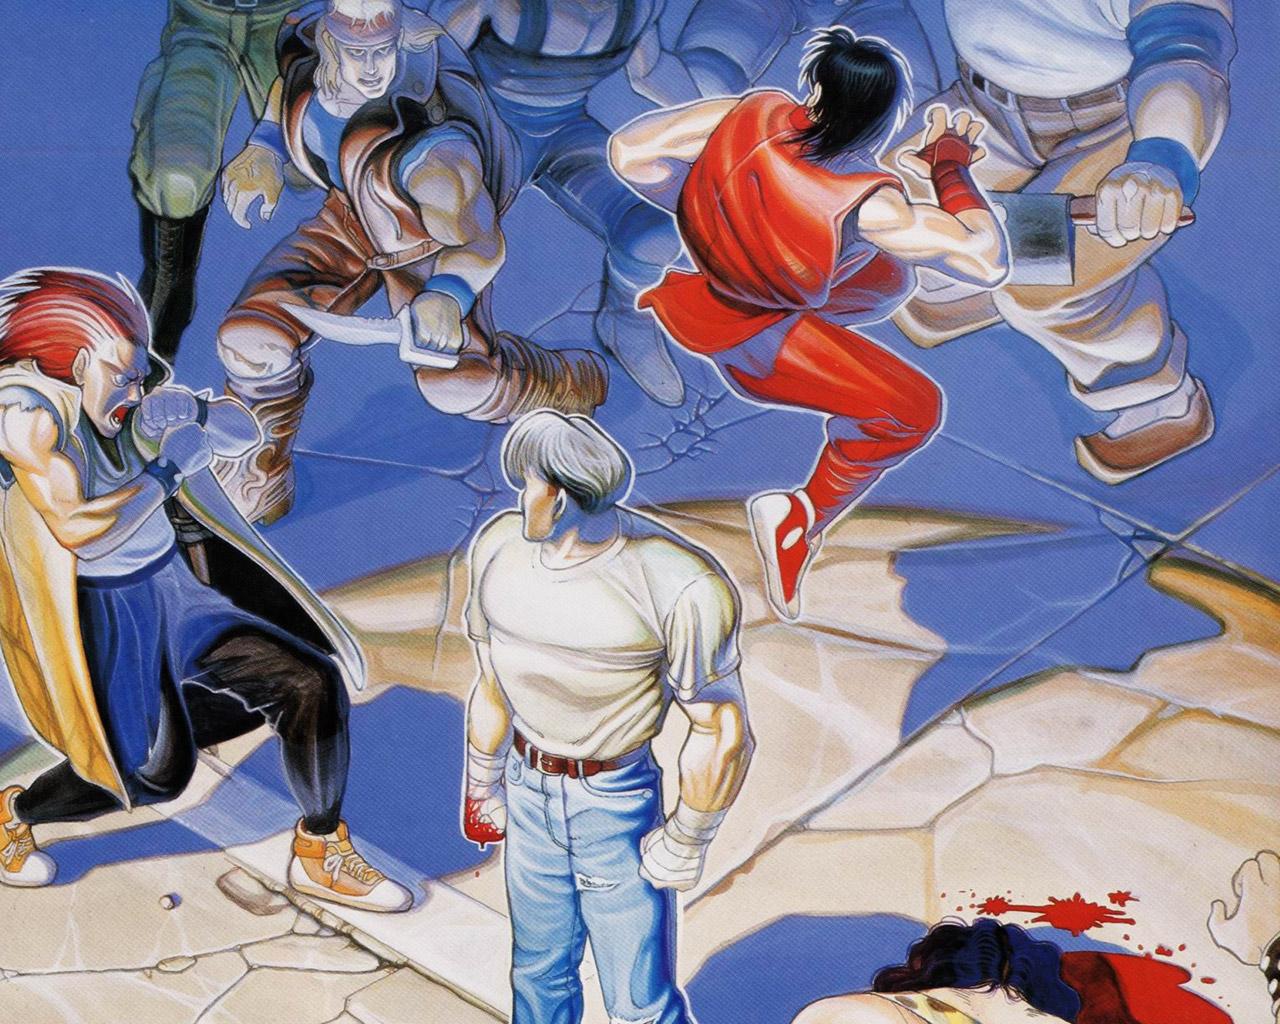 Free Download Final Fight Wallpaper In 1280x1024 1280x1024